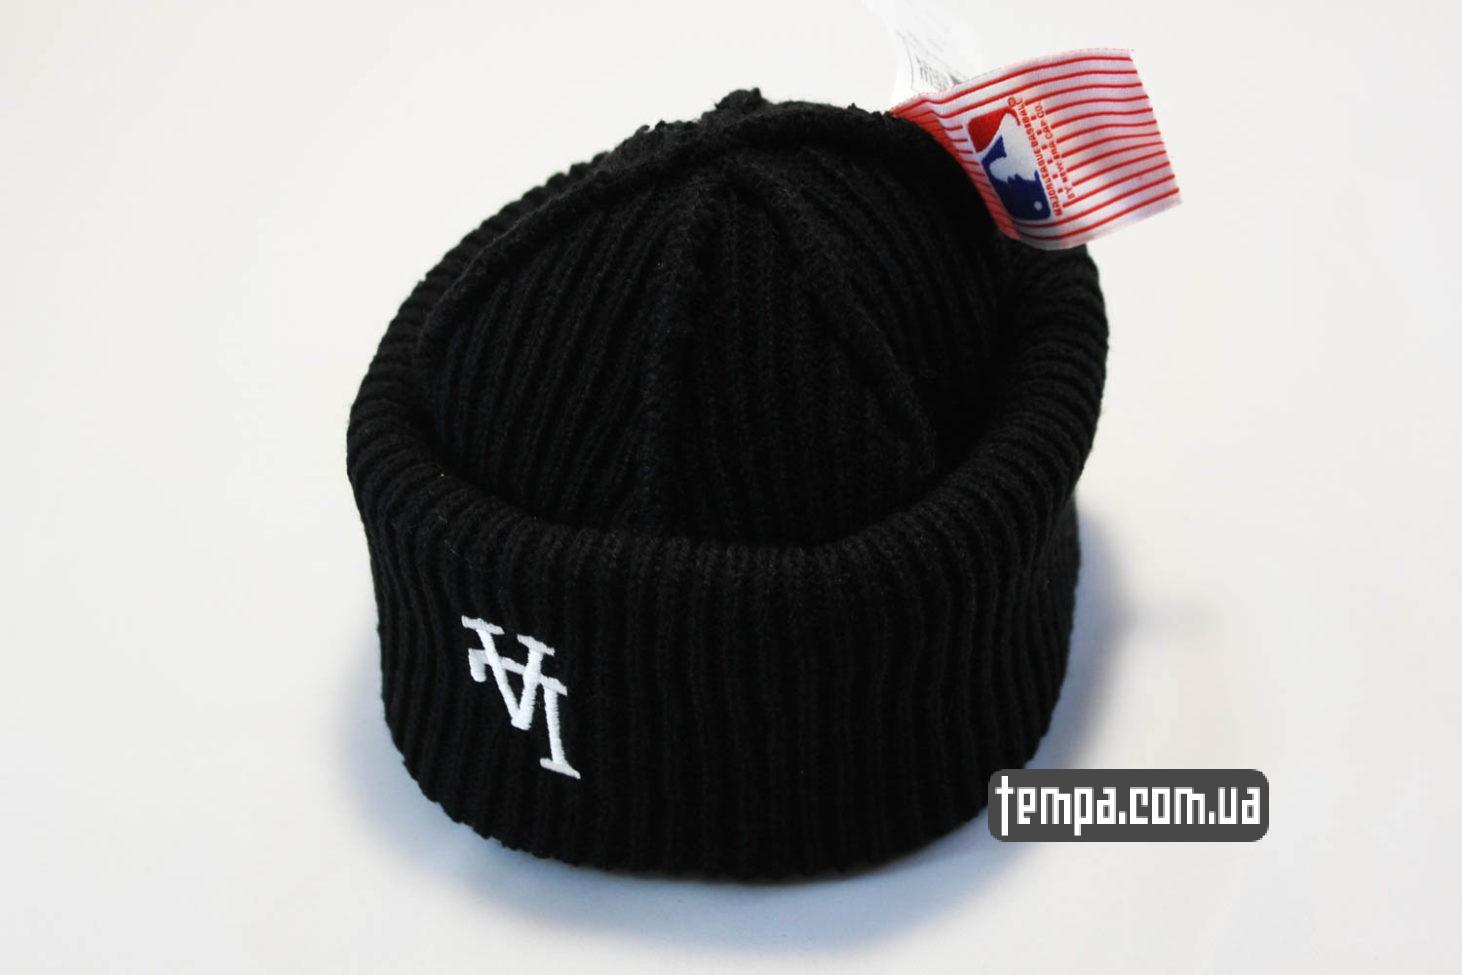 зимняя двойная мужская женская бини шапка beanie LA Los Angeles New Era black черная